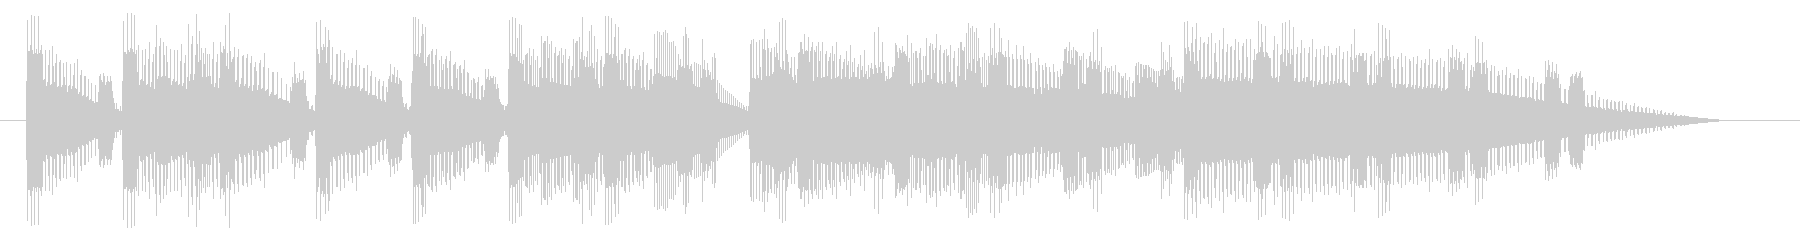 NES STG B04-1(スタート)の未再生の波形